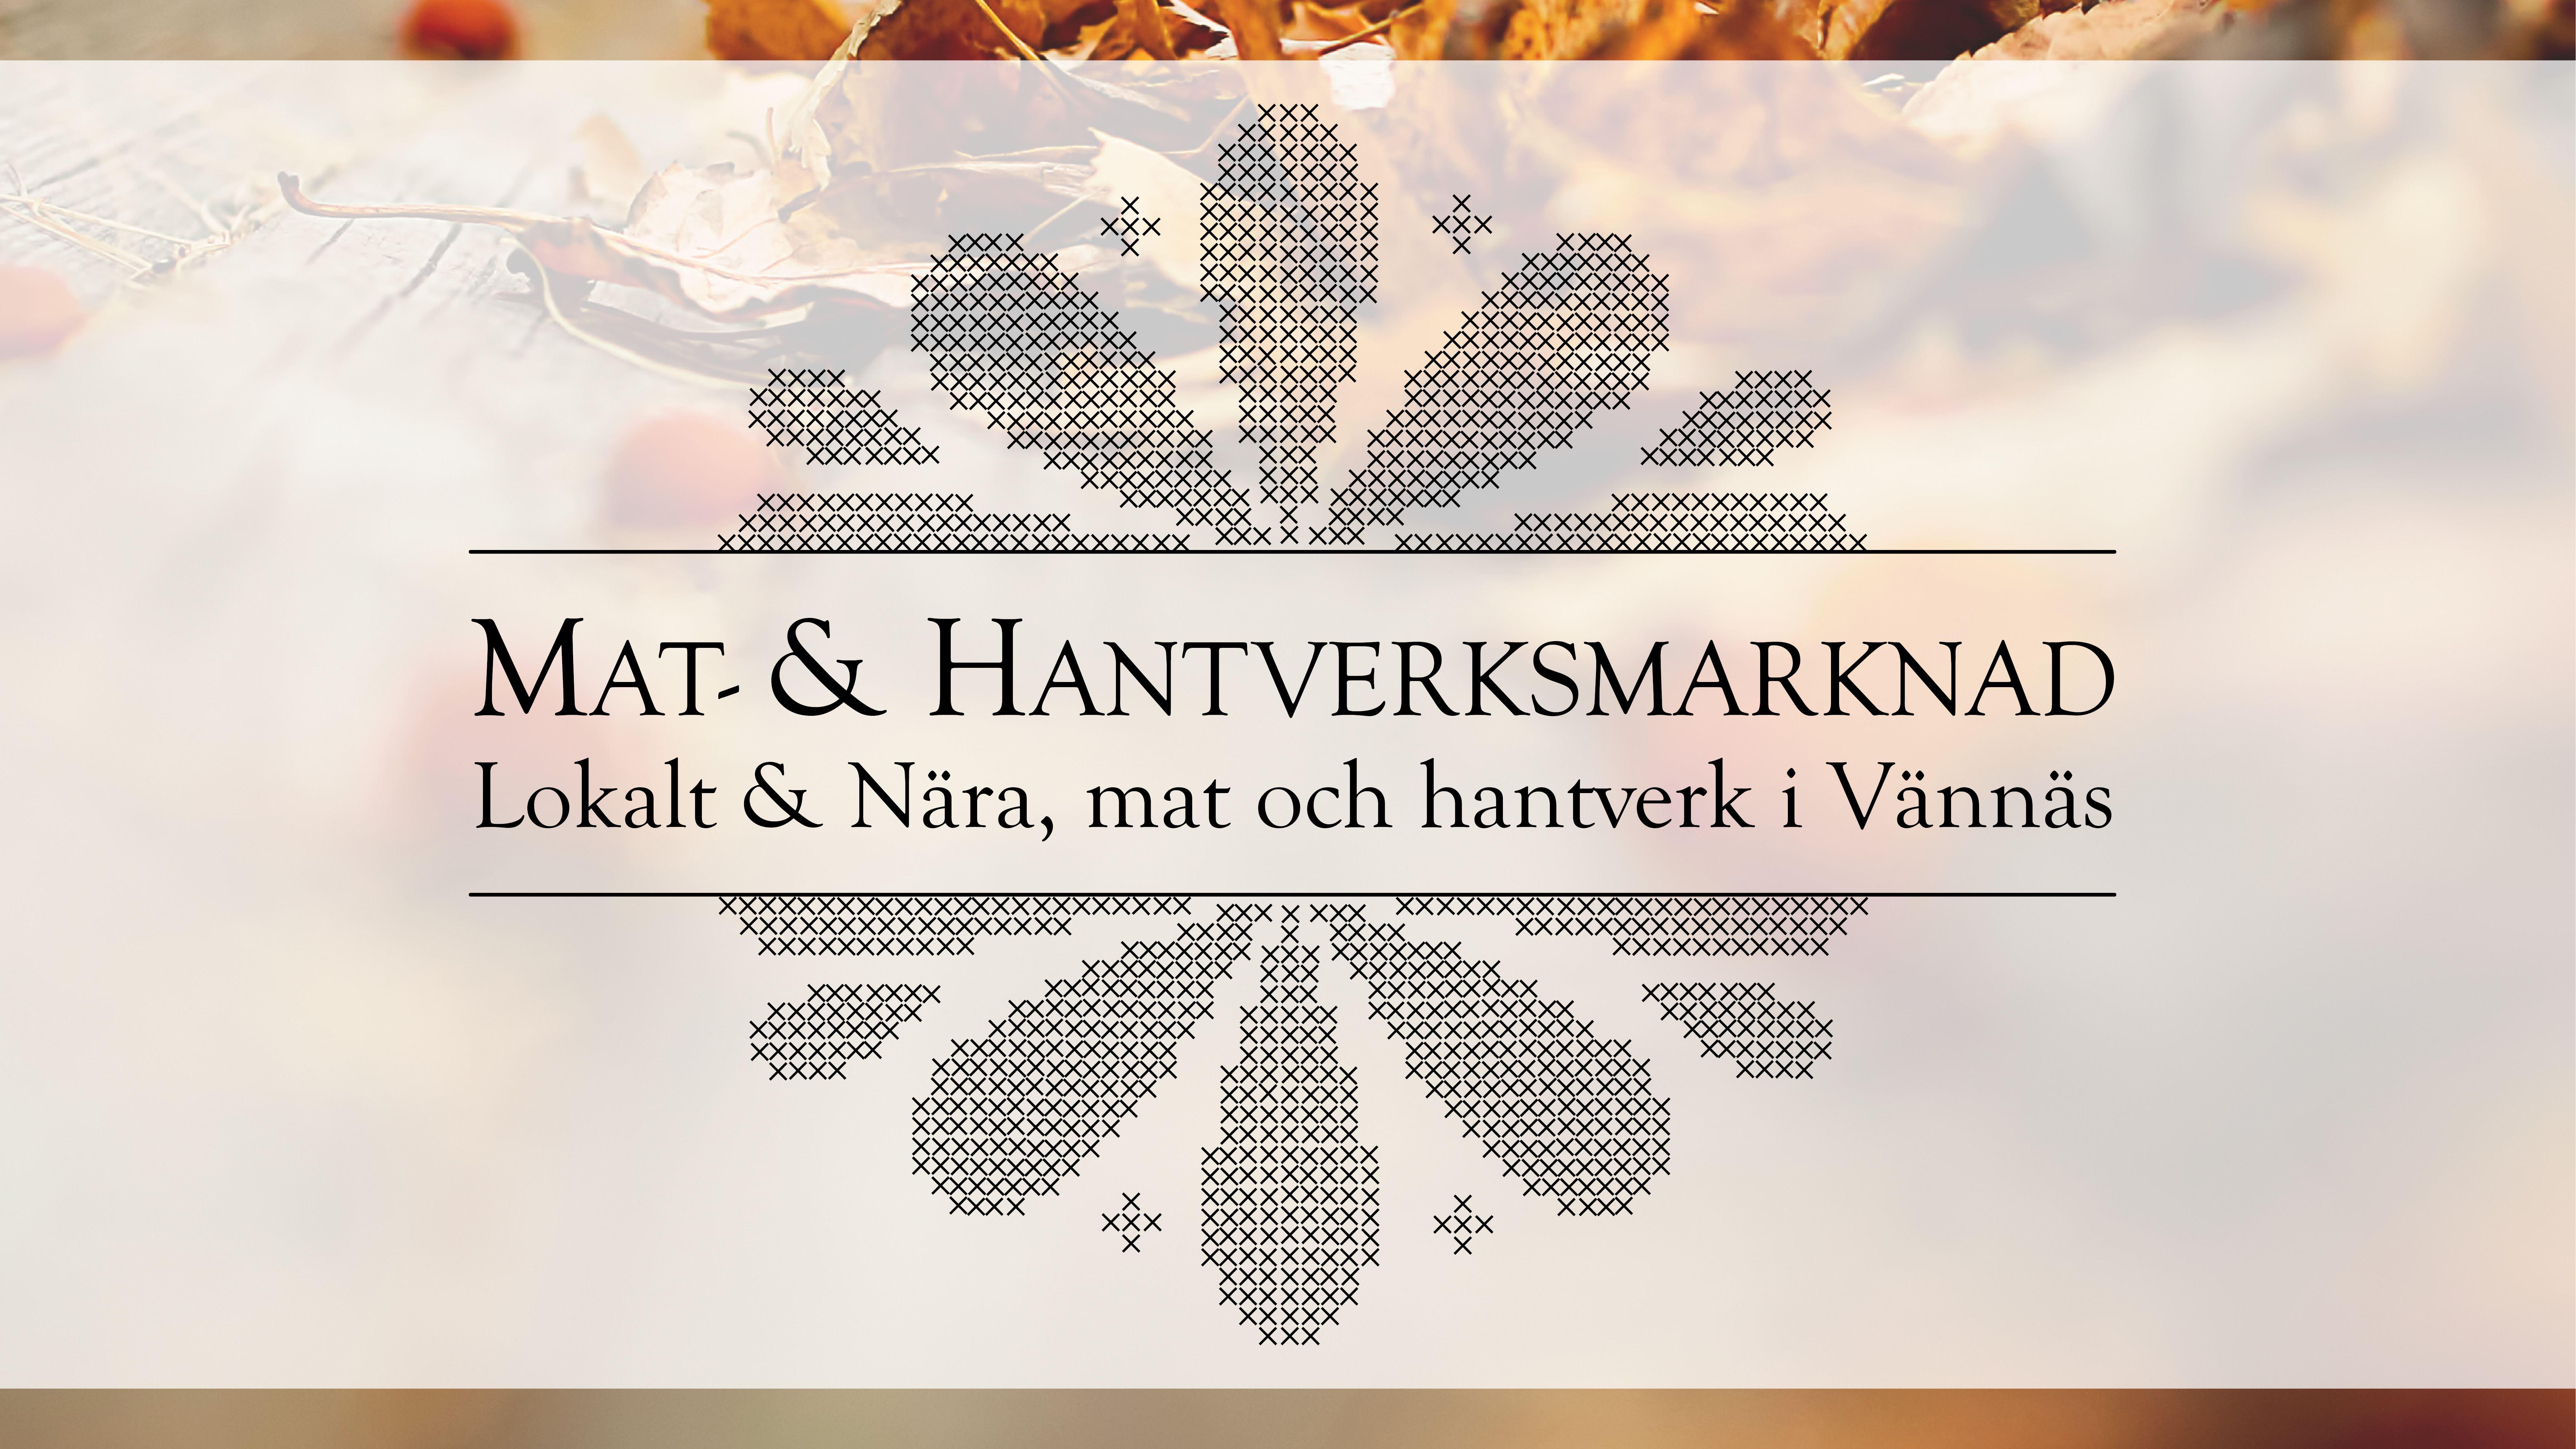 Mat- & Hantverksmarknad